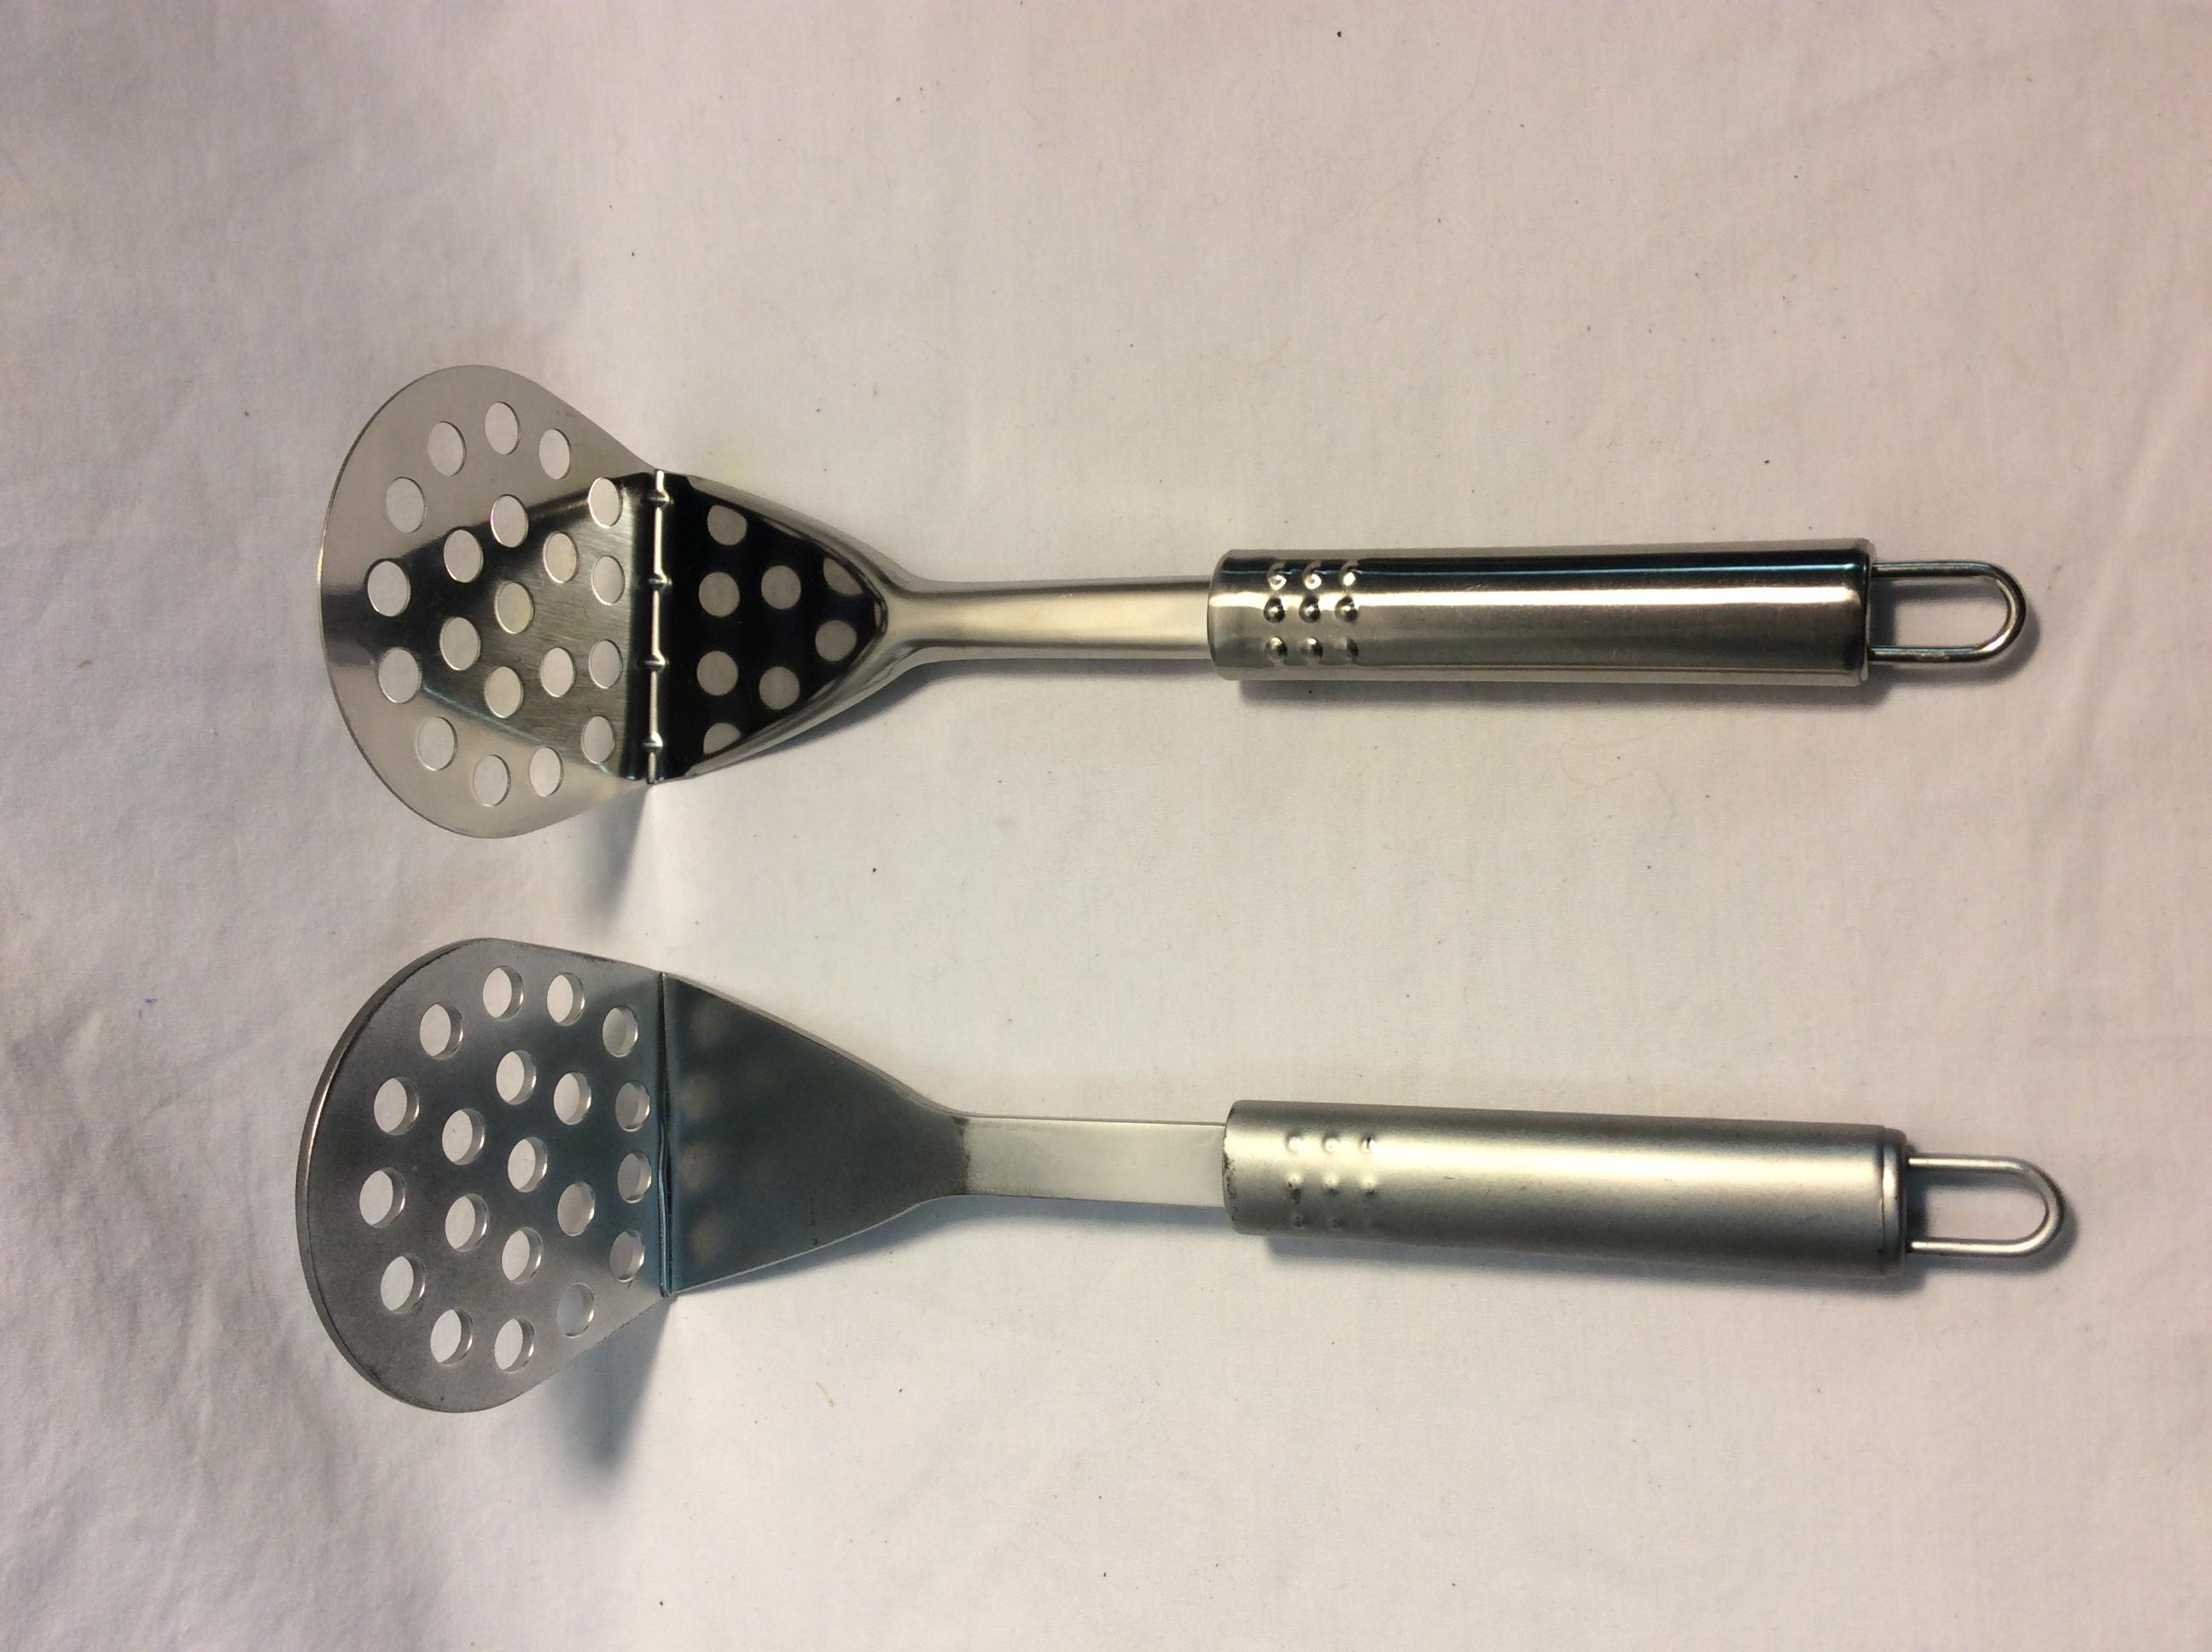 90 angled spatula - 3 plastic and 3 real